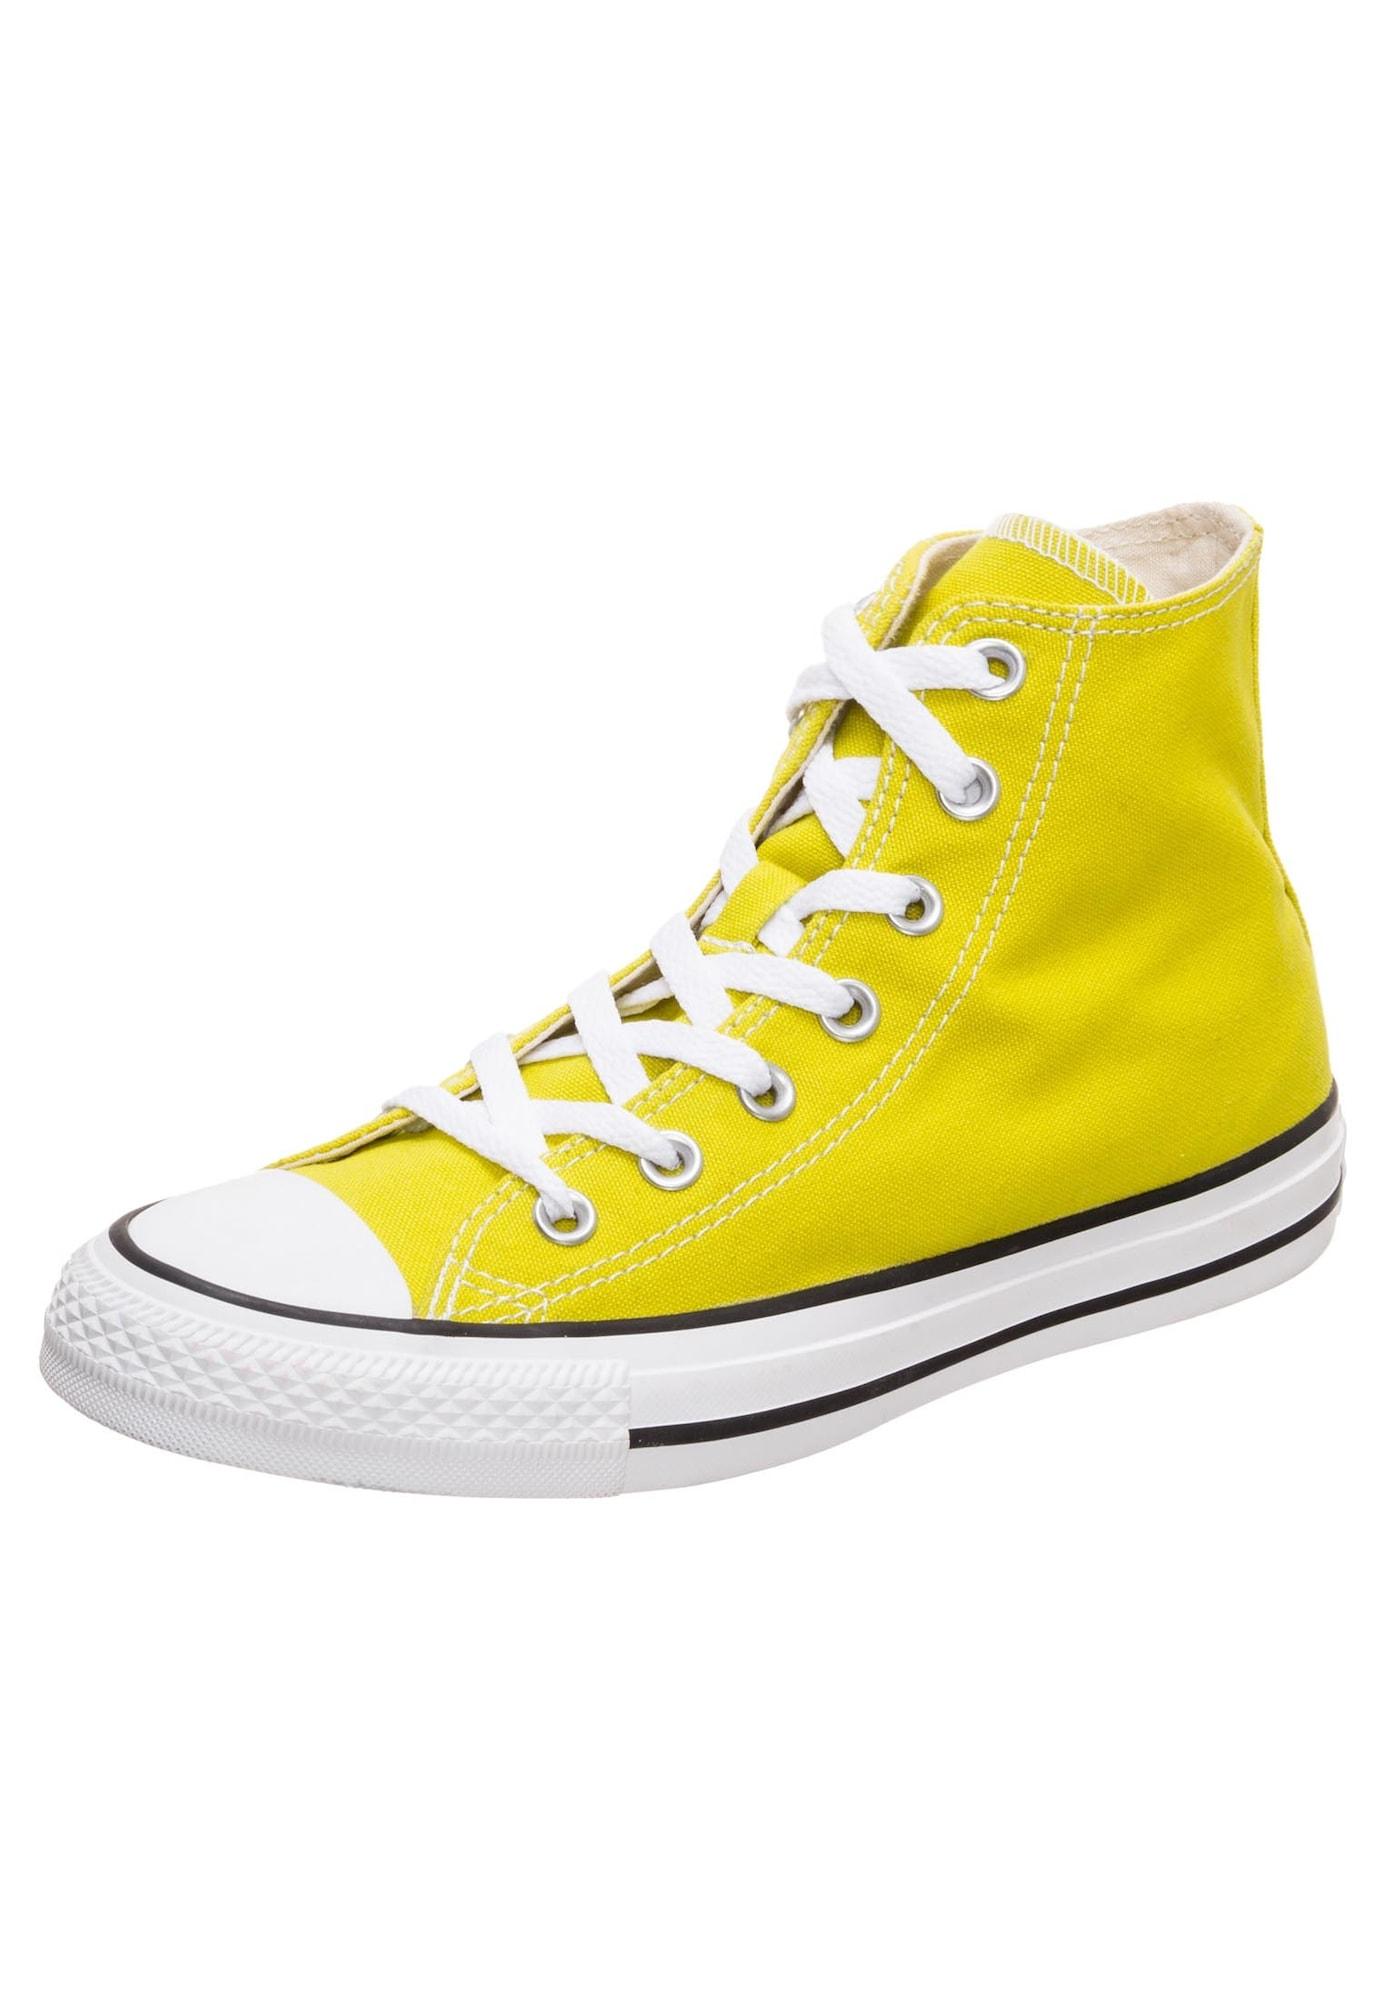 Kotníkové tenisky Chuck Taylor All Star žlutá bílá CONVERSE